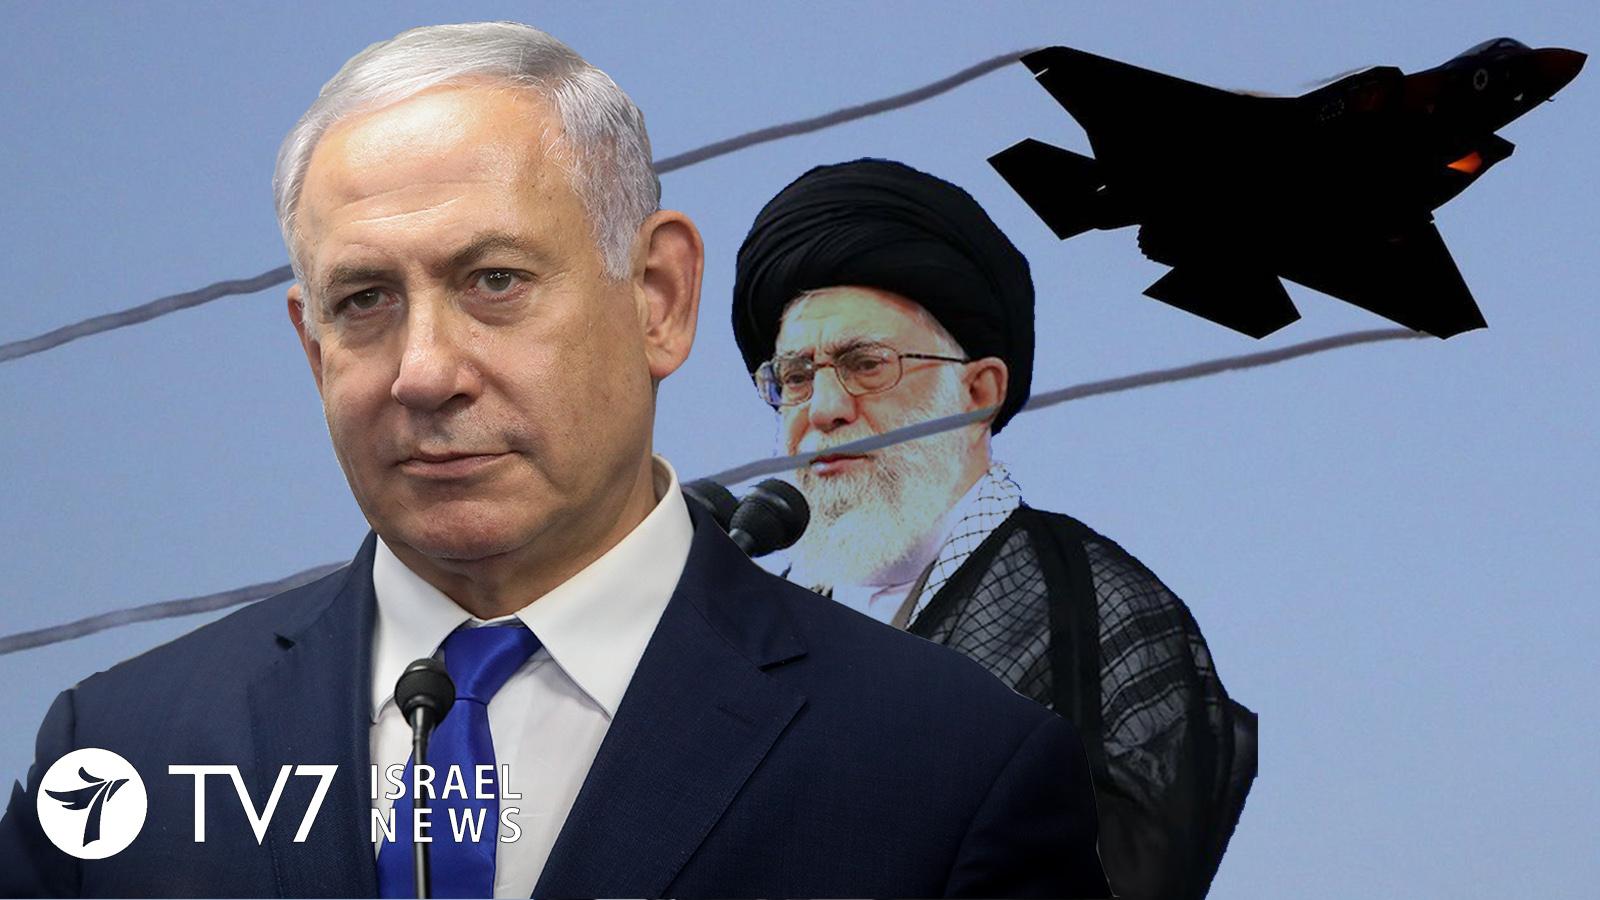 Israel' goal, 'thwarting Iran's efforts to annihilate the Jewish State' netanyahu and khamenei